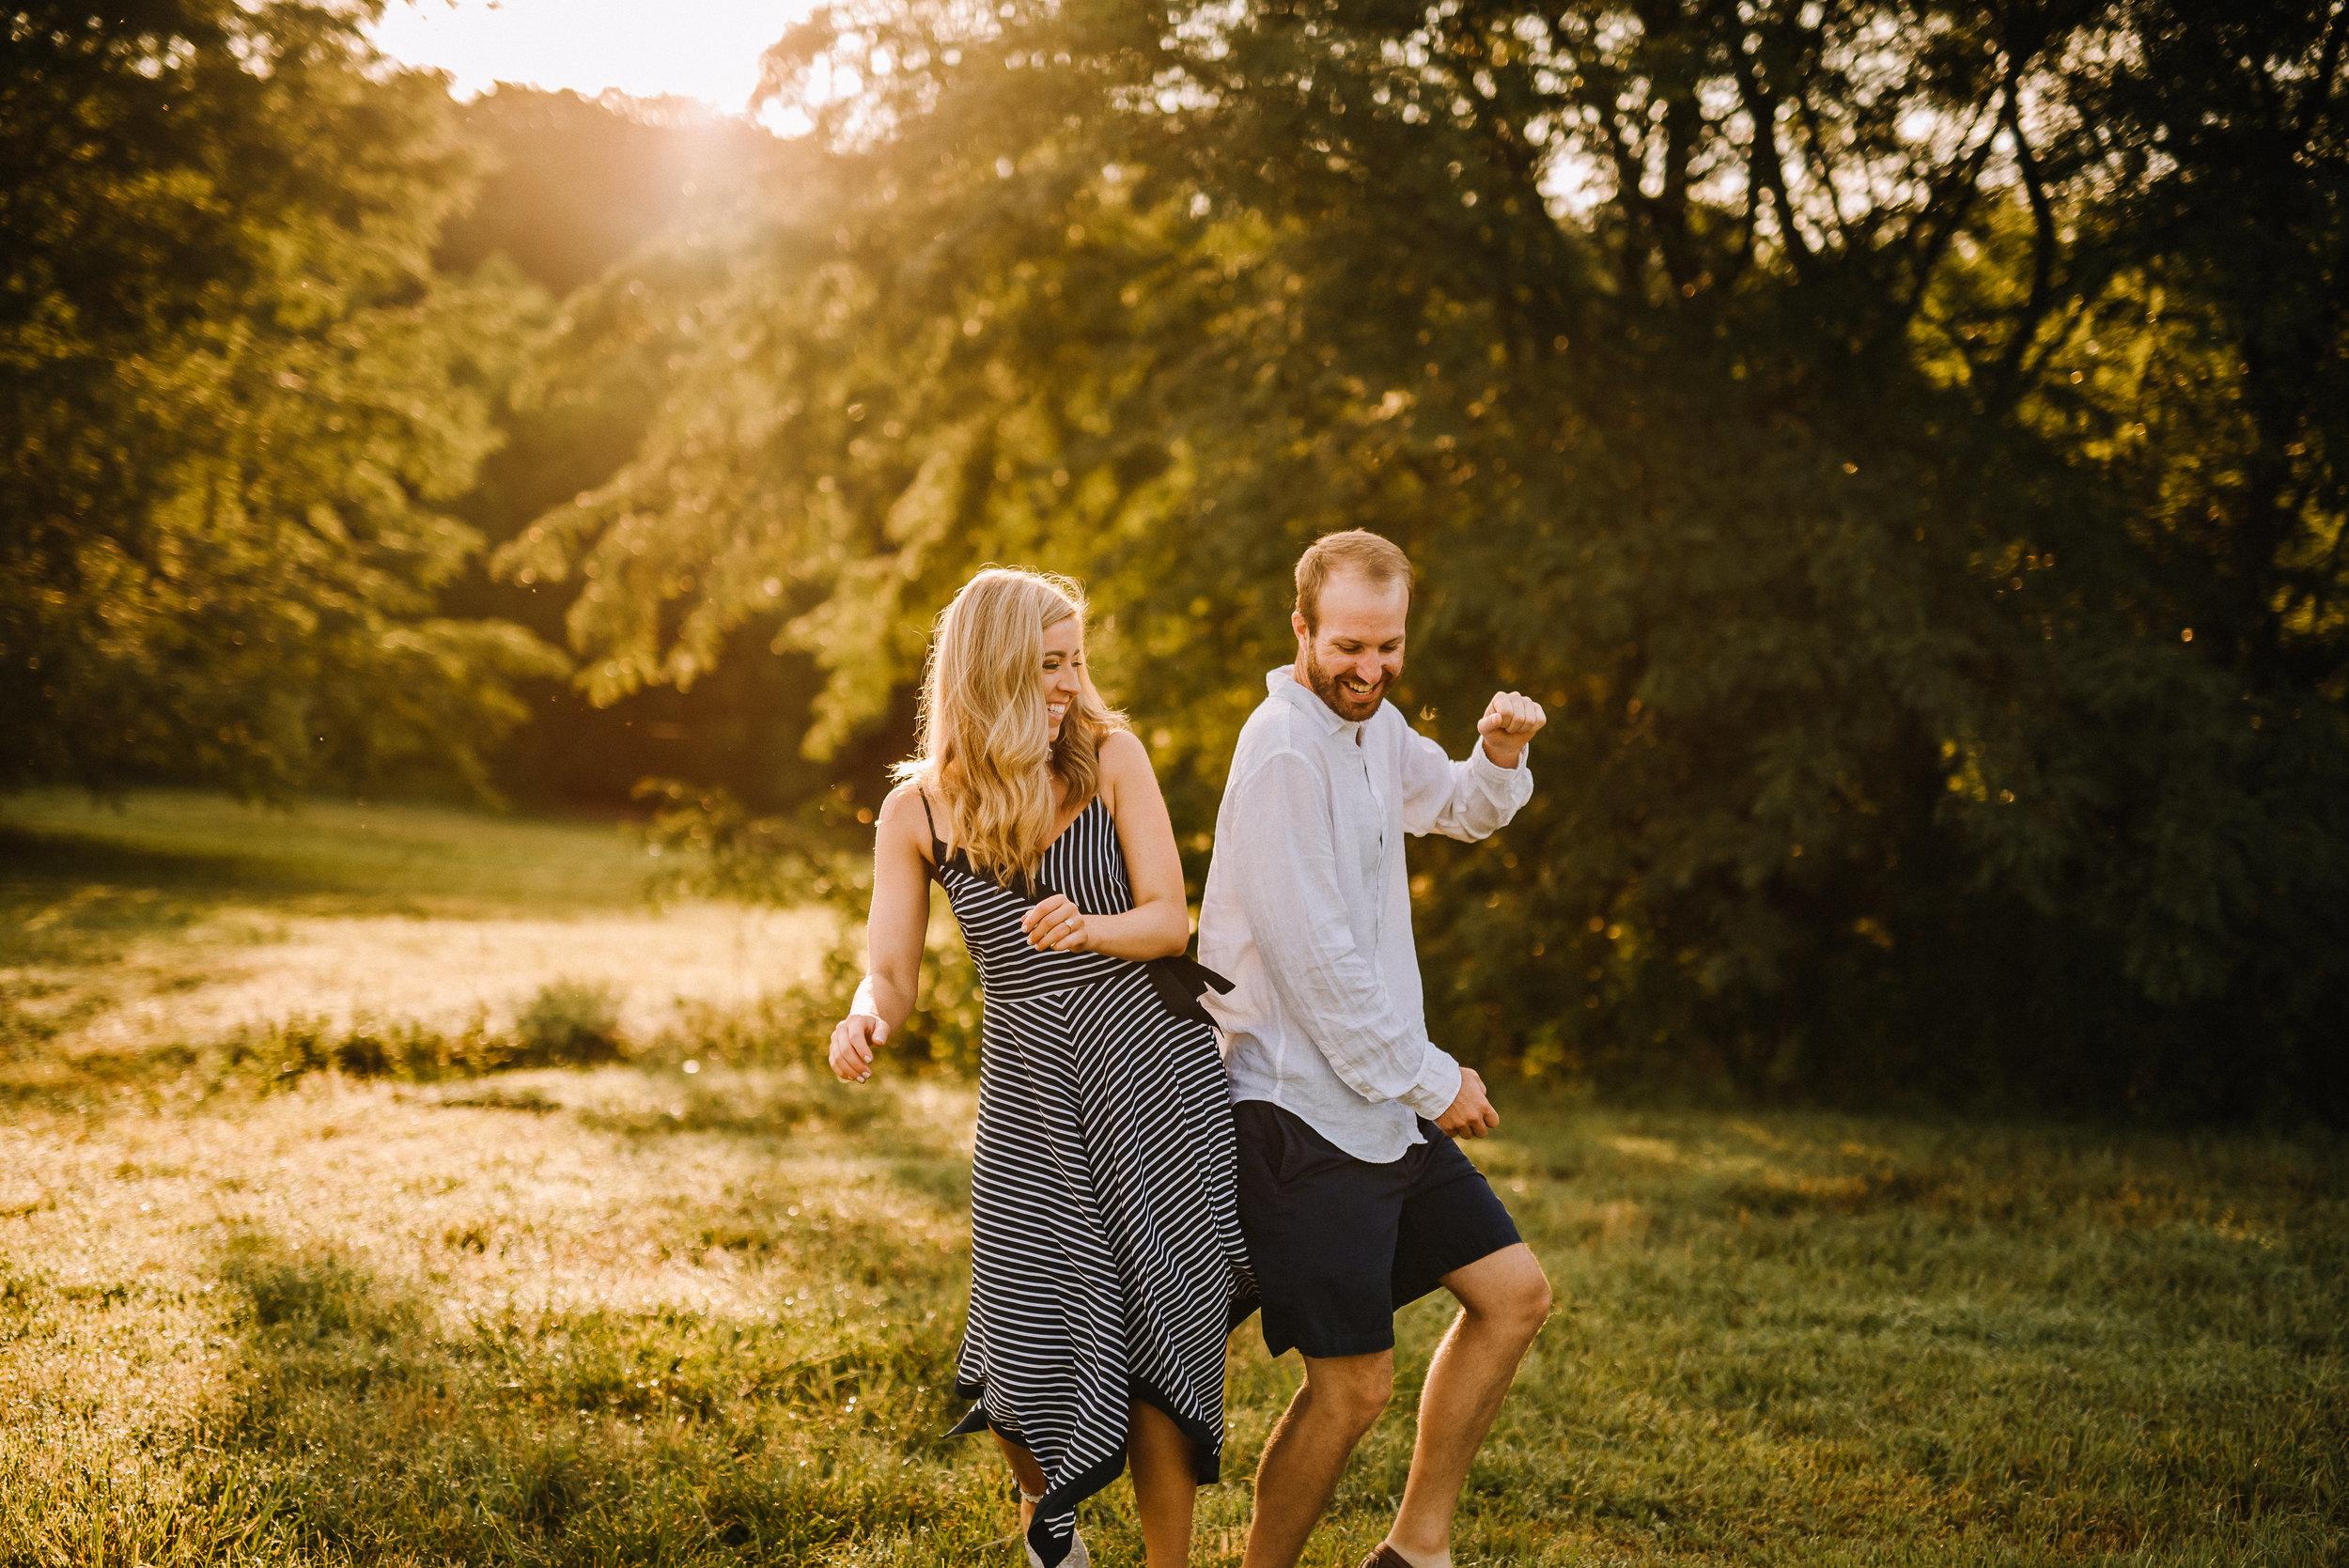 Meredith & Michael_Broad Ave_Shelby Farms_Ashley Benham Photography-150.jpg